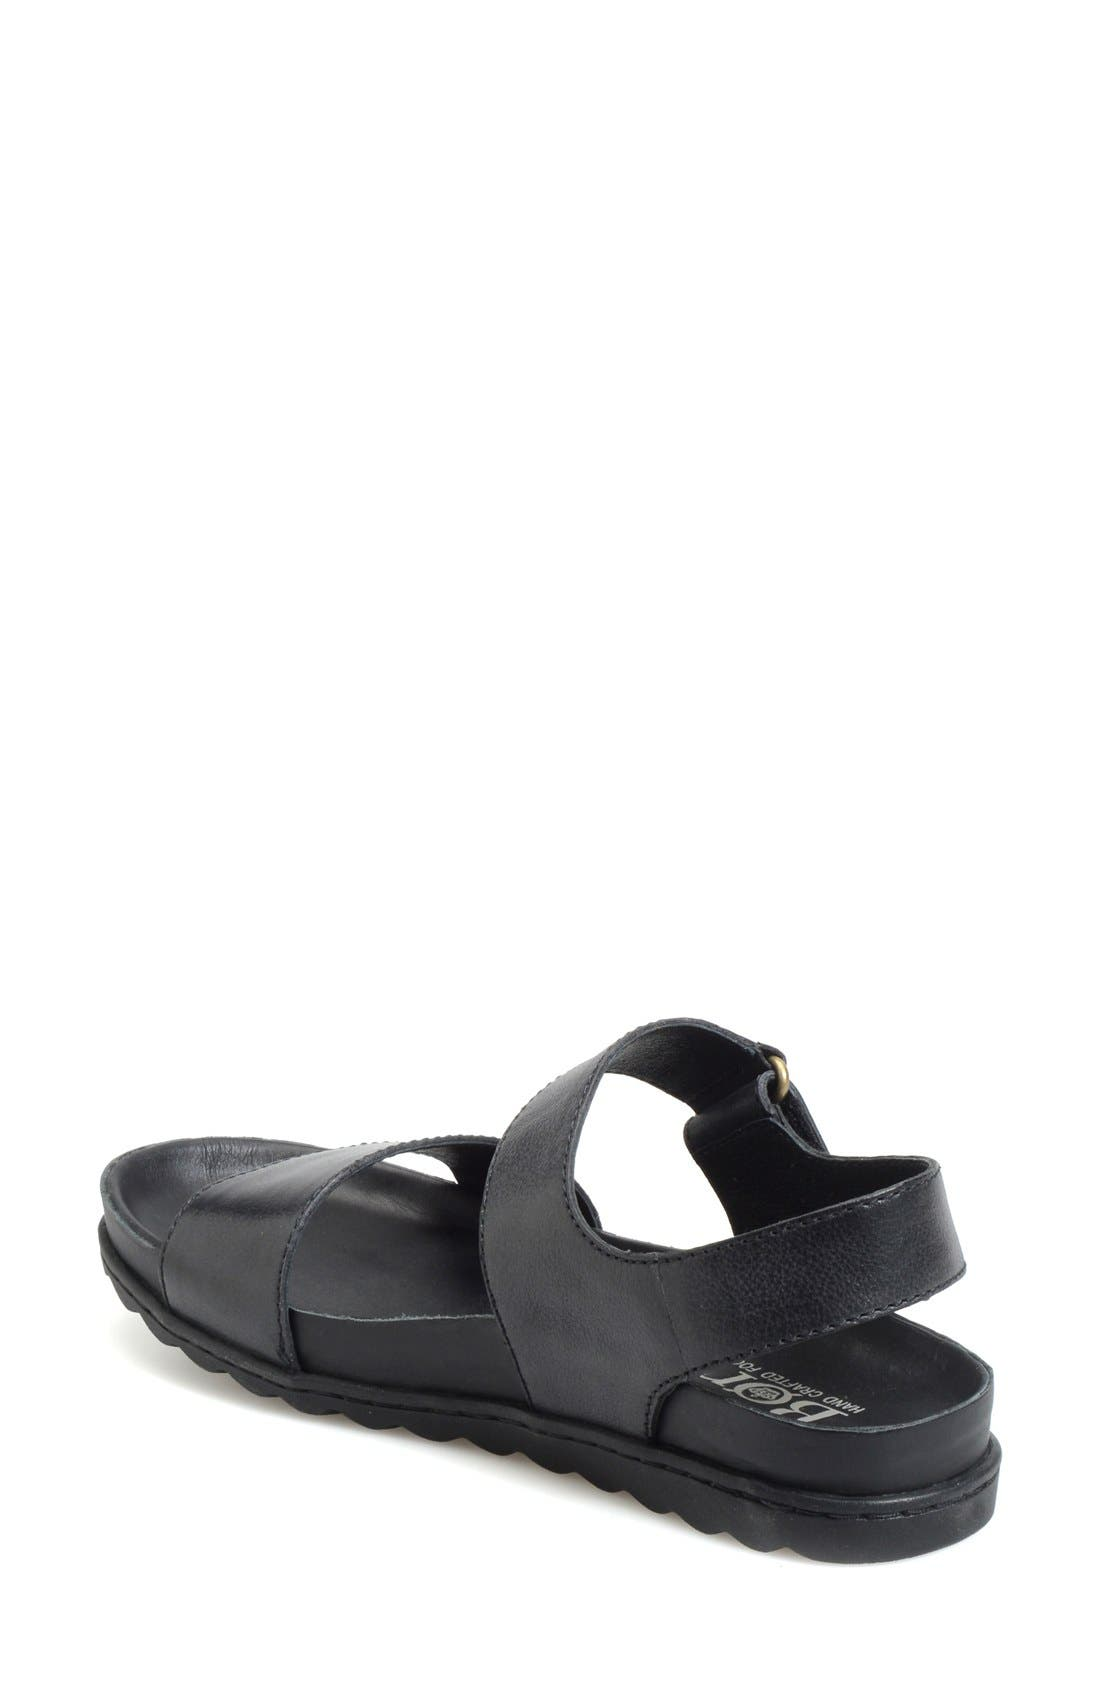 Alternate Image 2  - Børn 'Mardel' Leather Sandal (Women)